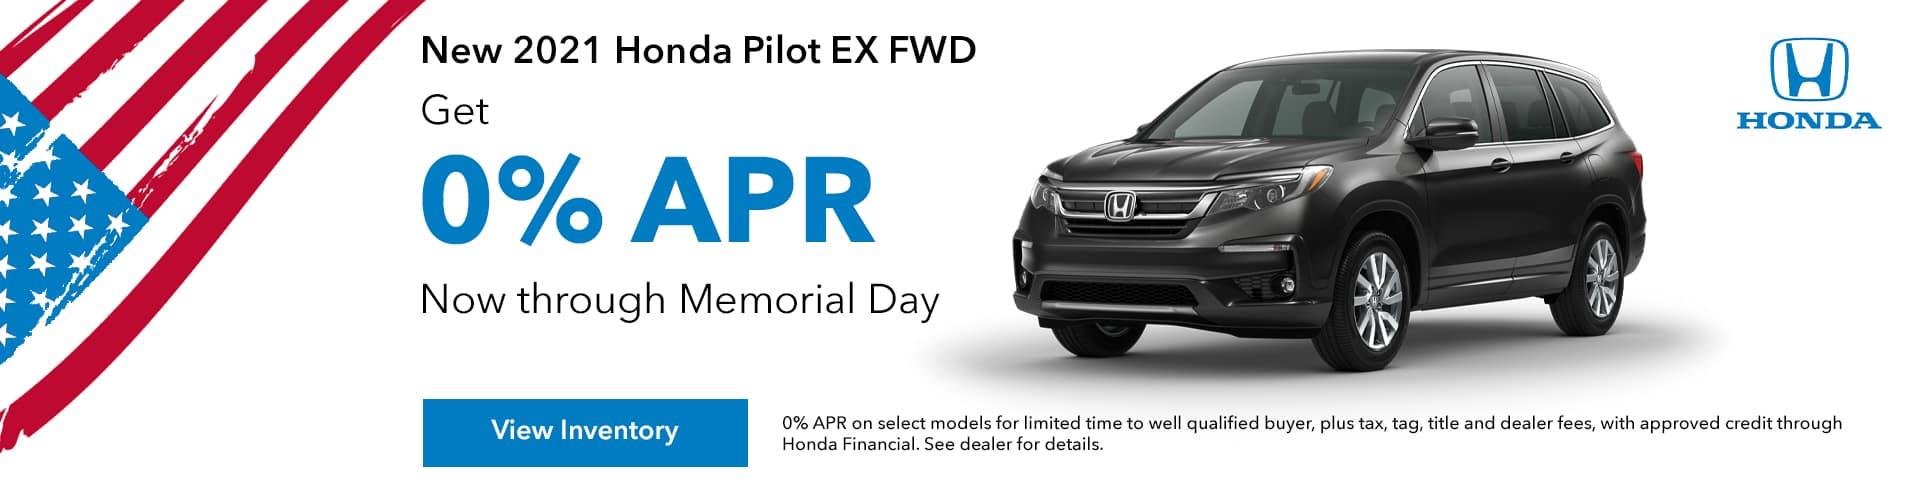 new 2021 Honda Pilot 0% APR, Get 0% APR For 60 Months